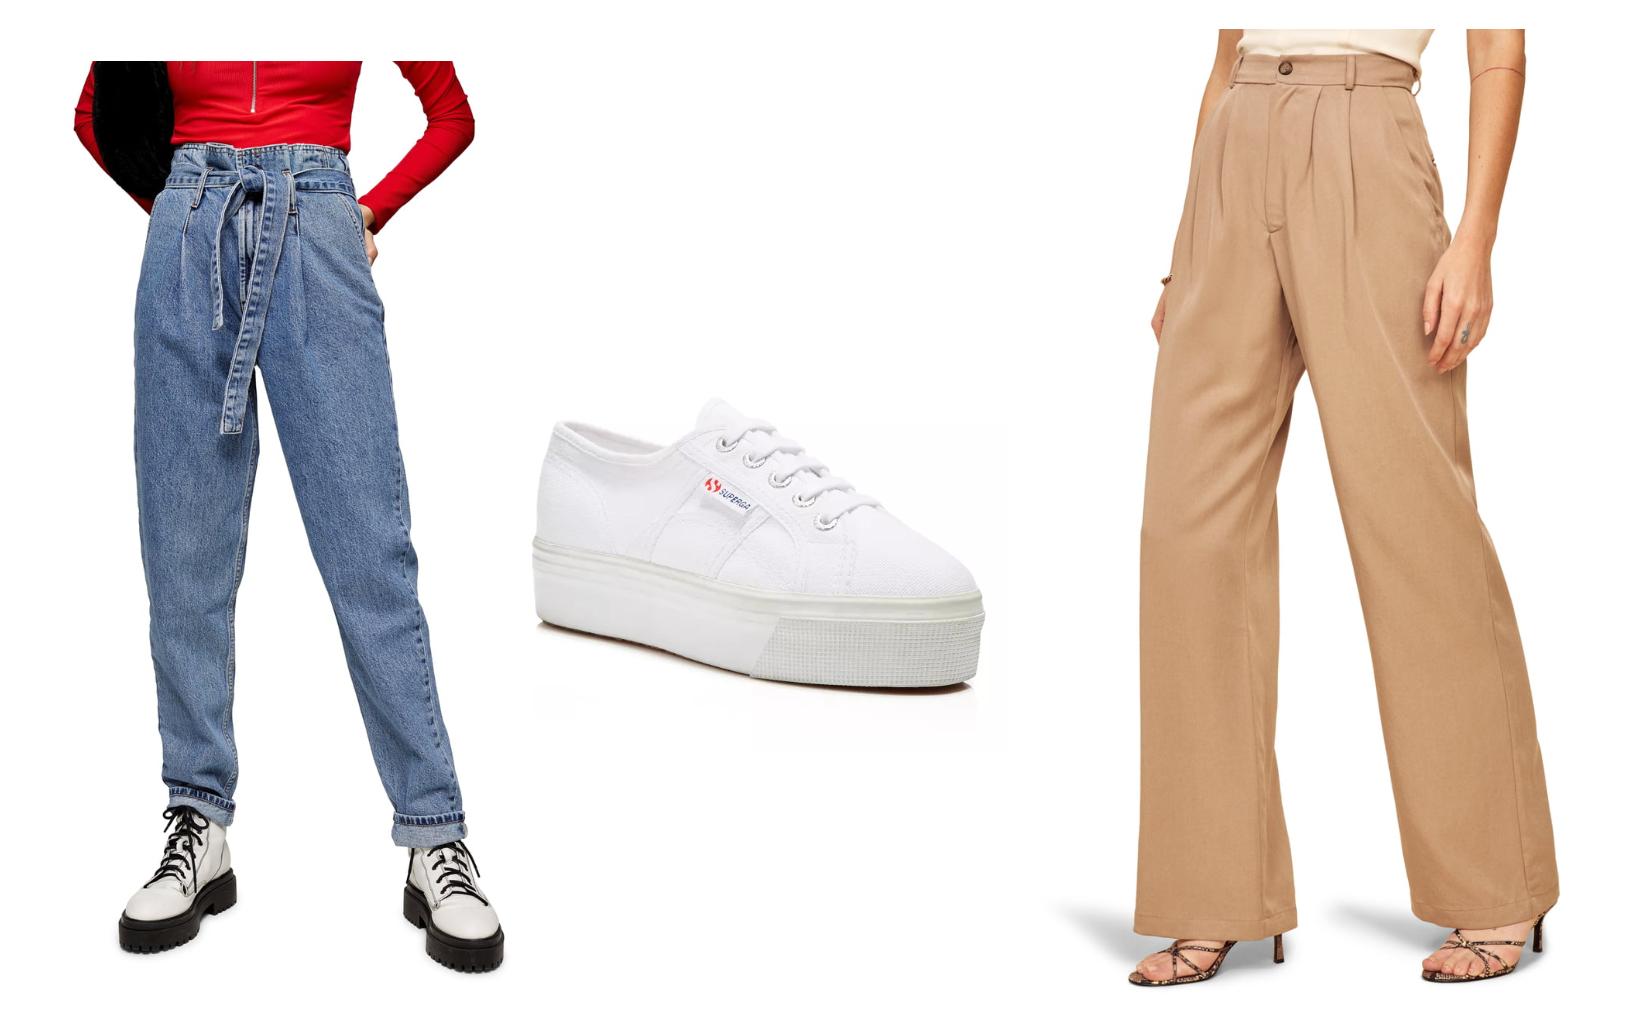 90's decade trends